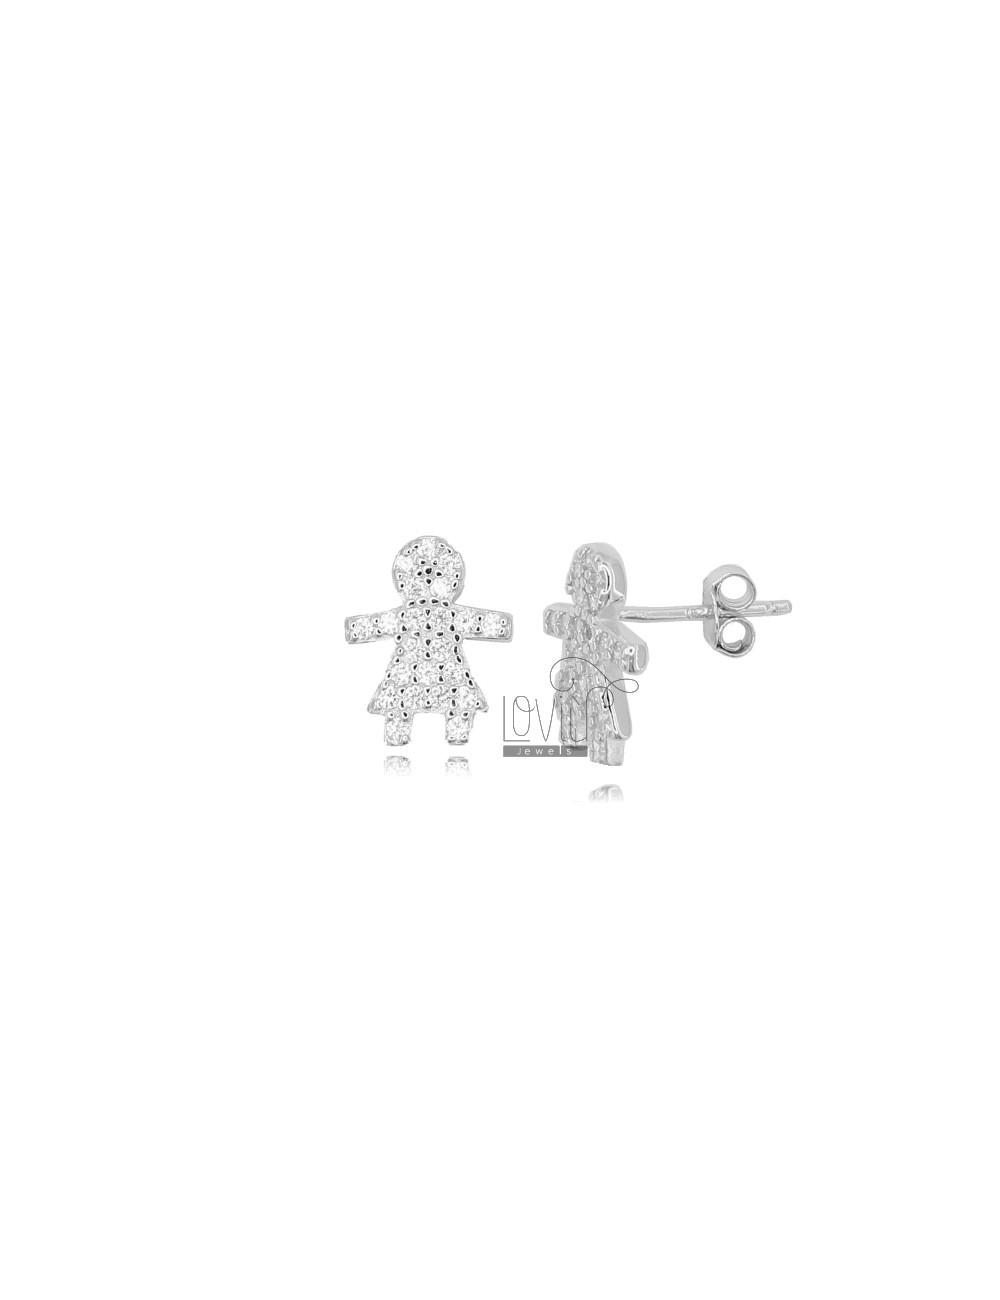 LOBO GIRL EARRINGS 12X10 MM SILVER RHODIUM TIT 925 AND WHITE ZIRCONIA